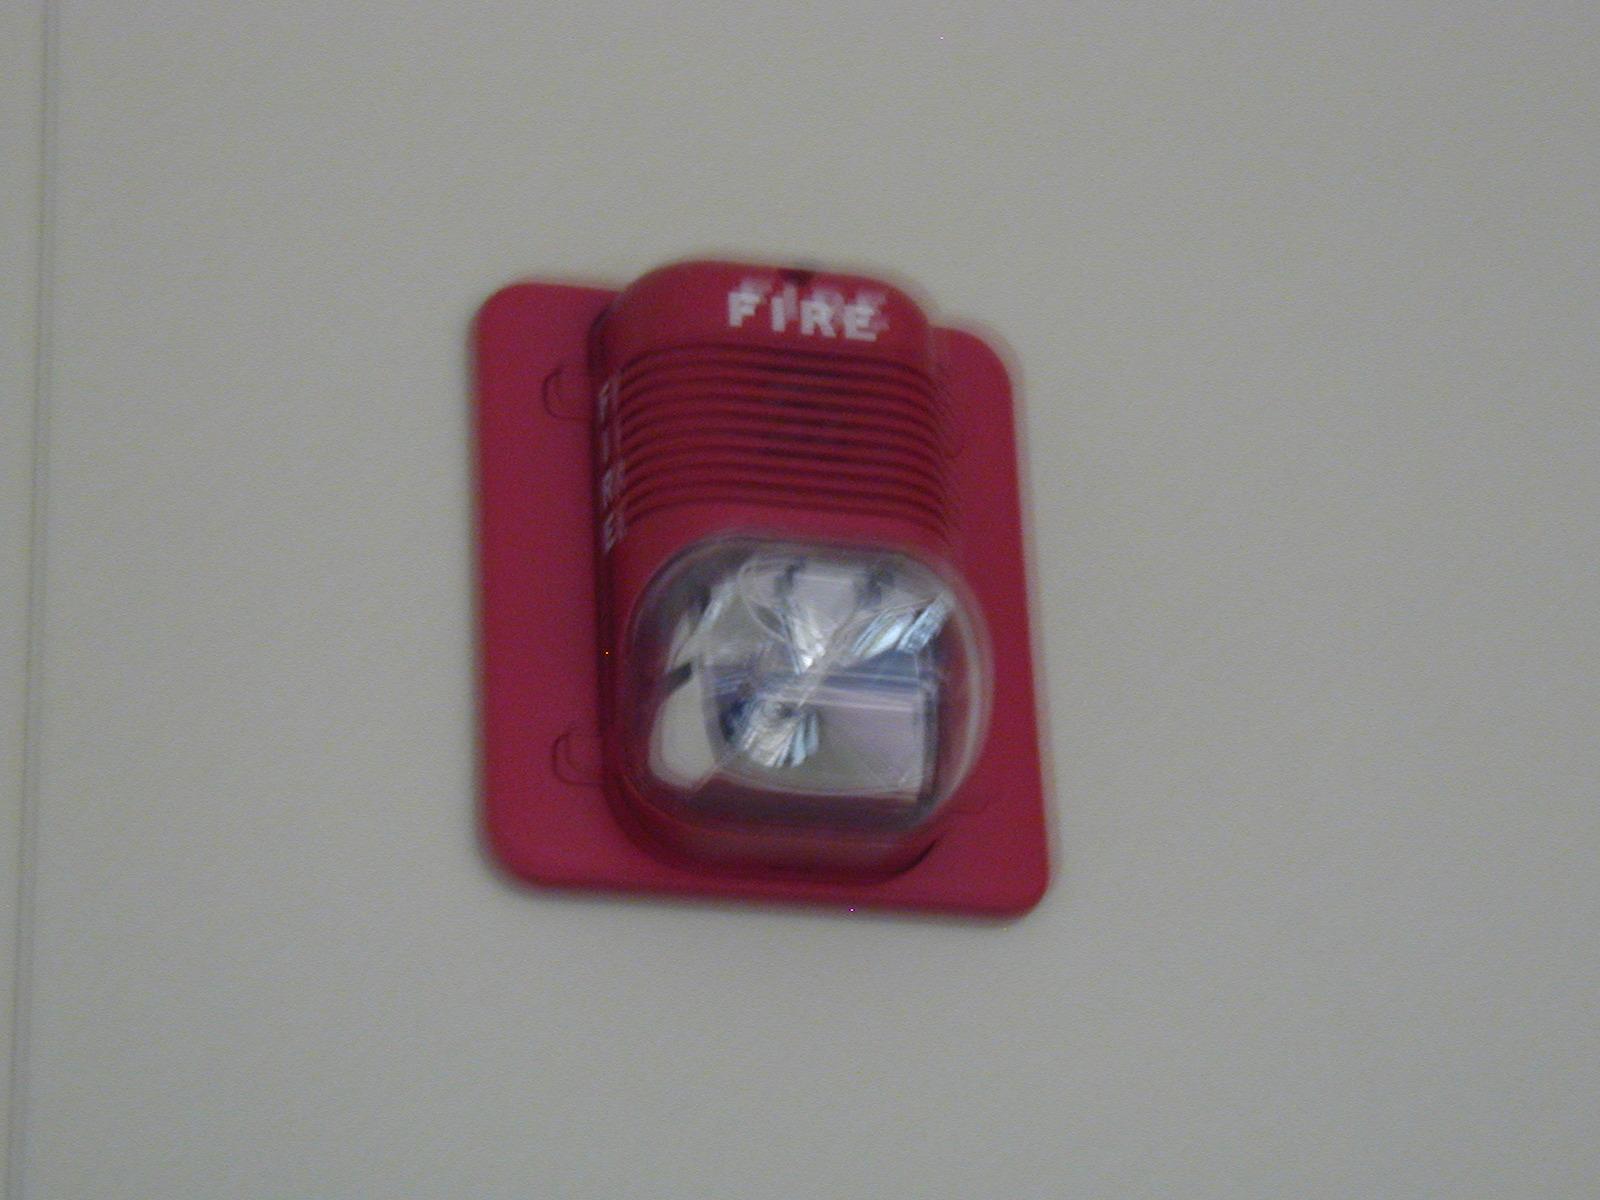 SPECTRALERT CLASSIC FIRE ALARM